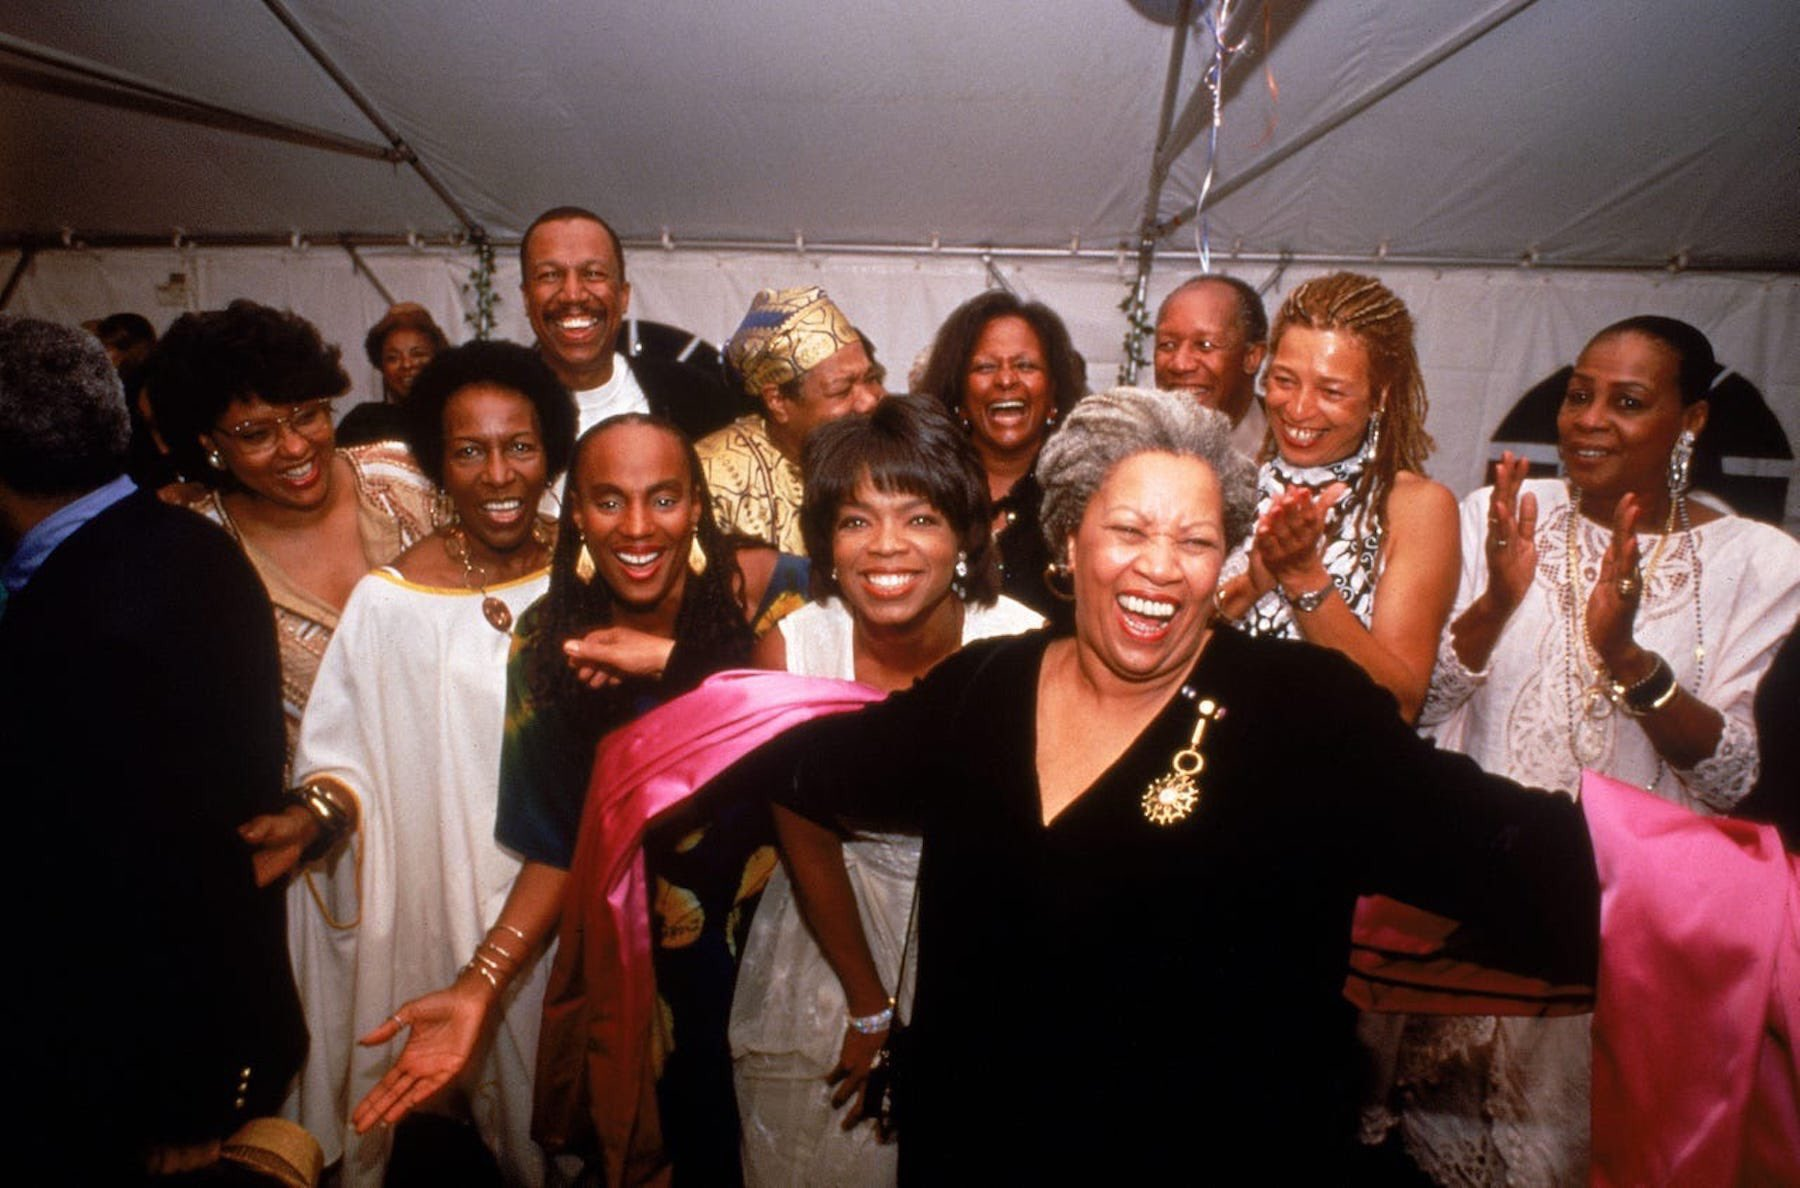 Toni Morrison, Susan Taylor, Rita Dove, Oprah Winfrey, Amina Baraka, Angela Davis, Maya Angelou & others celebrating Toni Morrison's Nobel Prize in Literature   photo credit : Will McIntyre/Time Life Pictures/Getty Images 